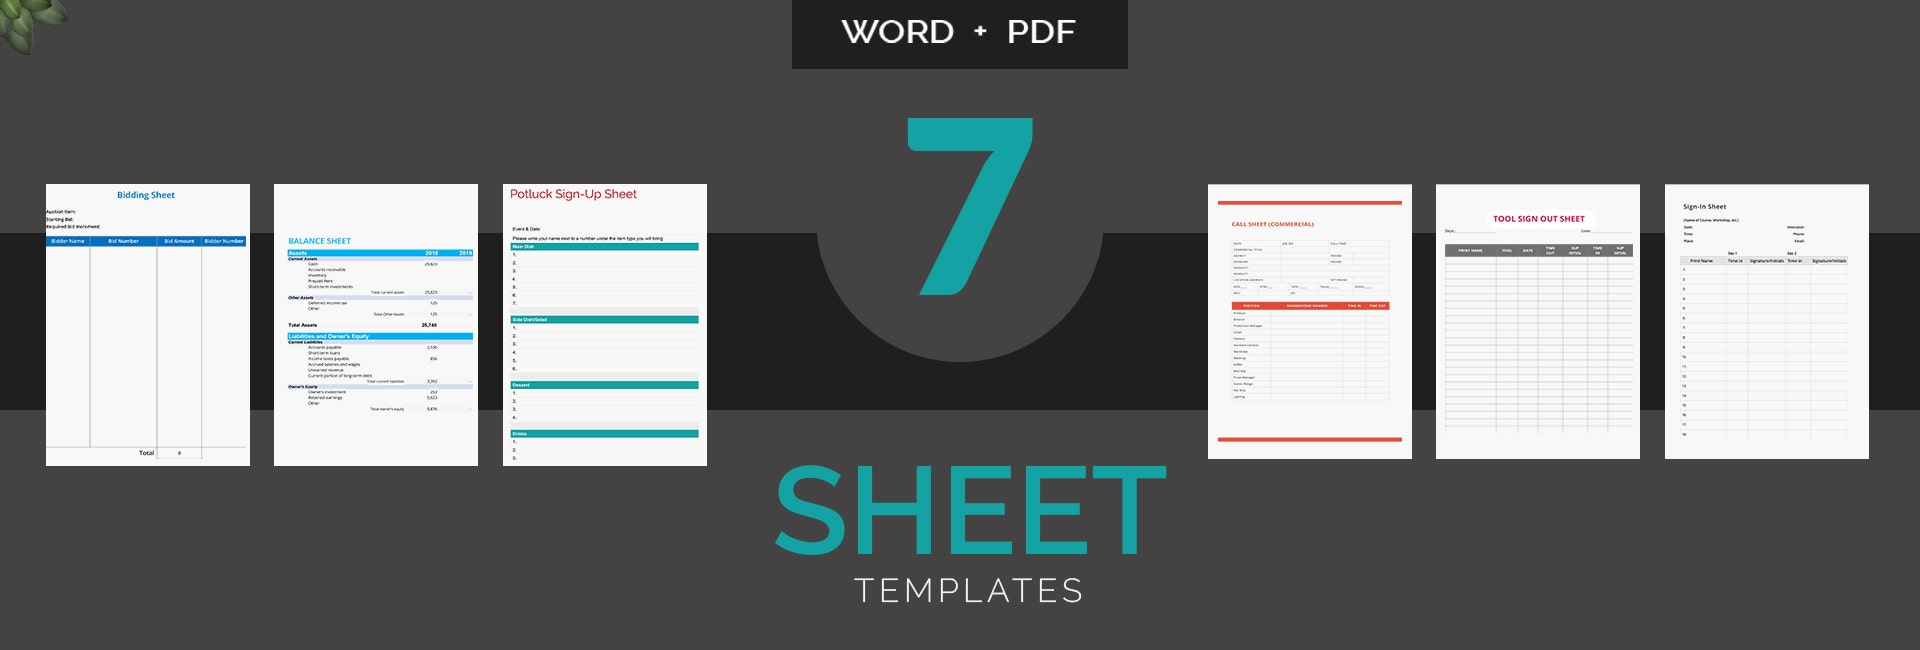 sheettemplatesbundle1